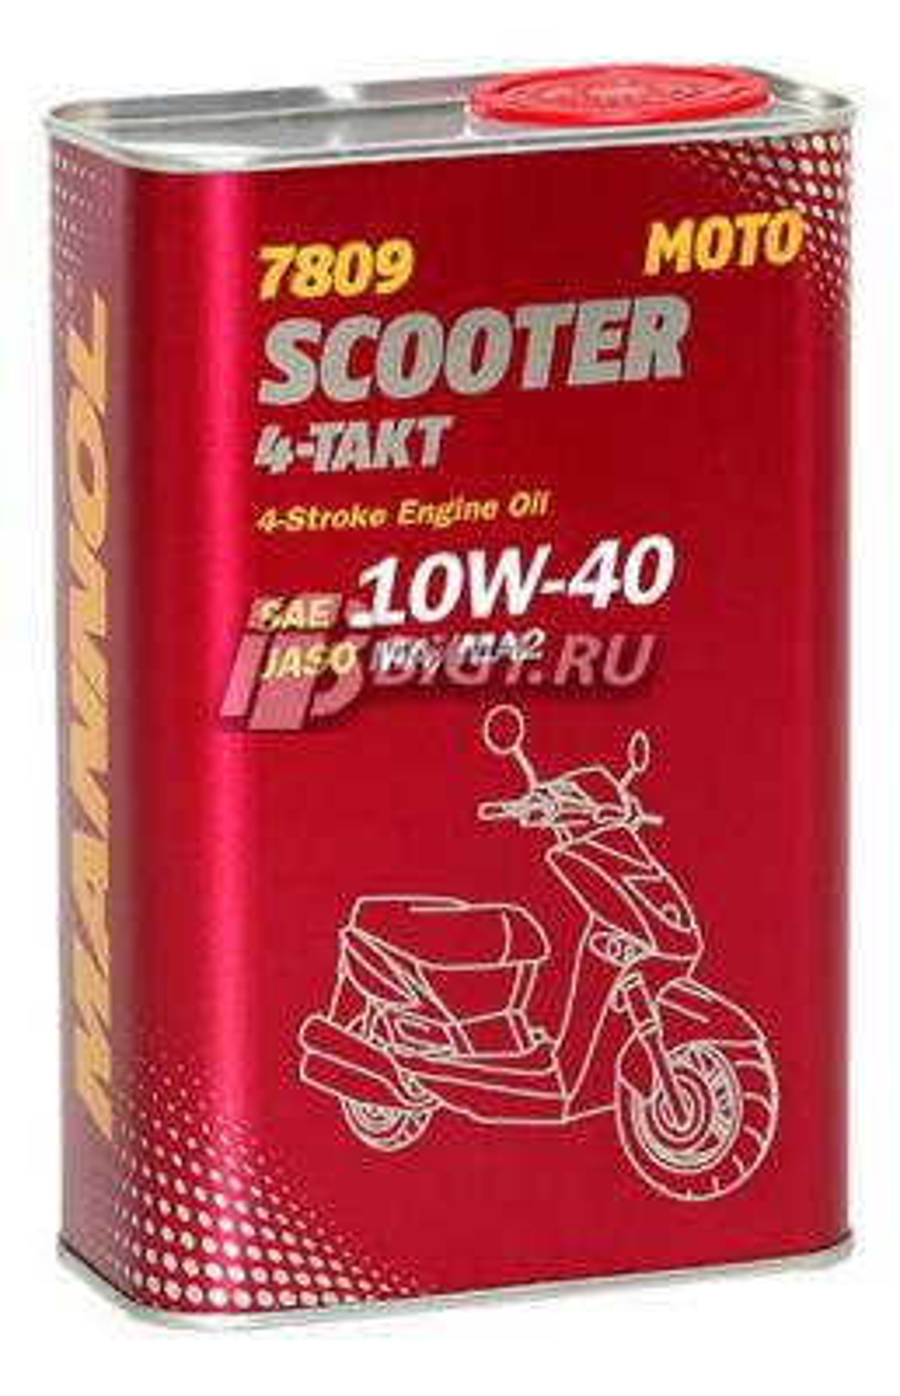 Масло моторное синтетическое 4-Takt Scooter 10W-40, 1л